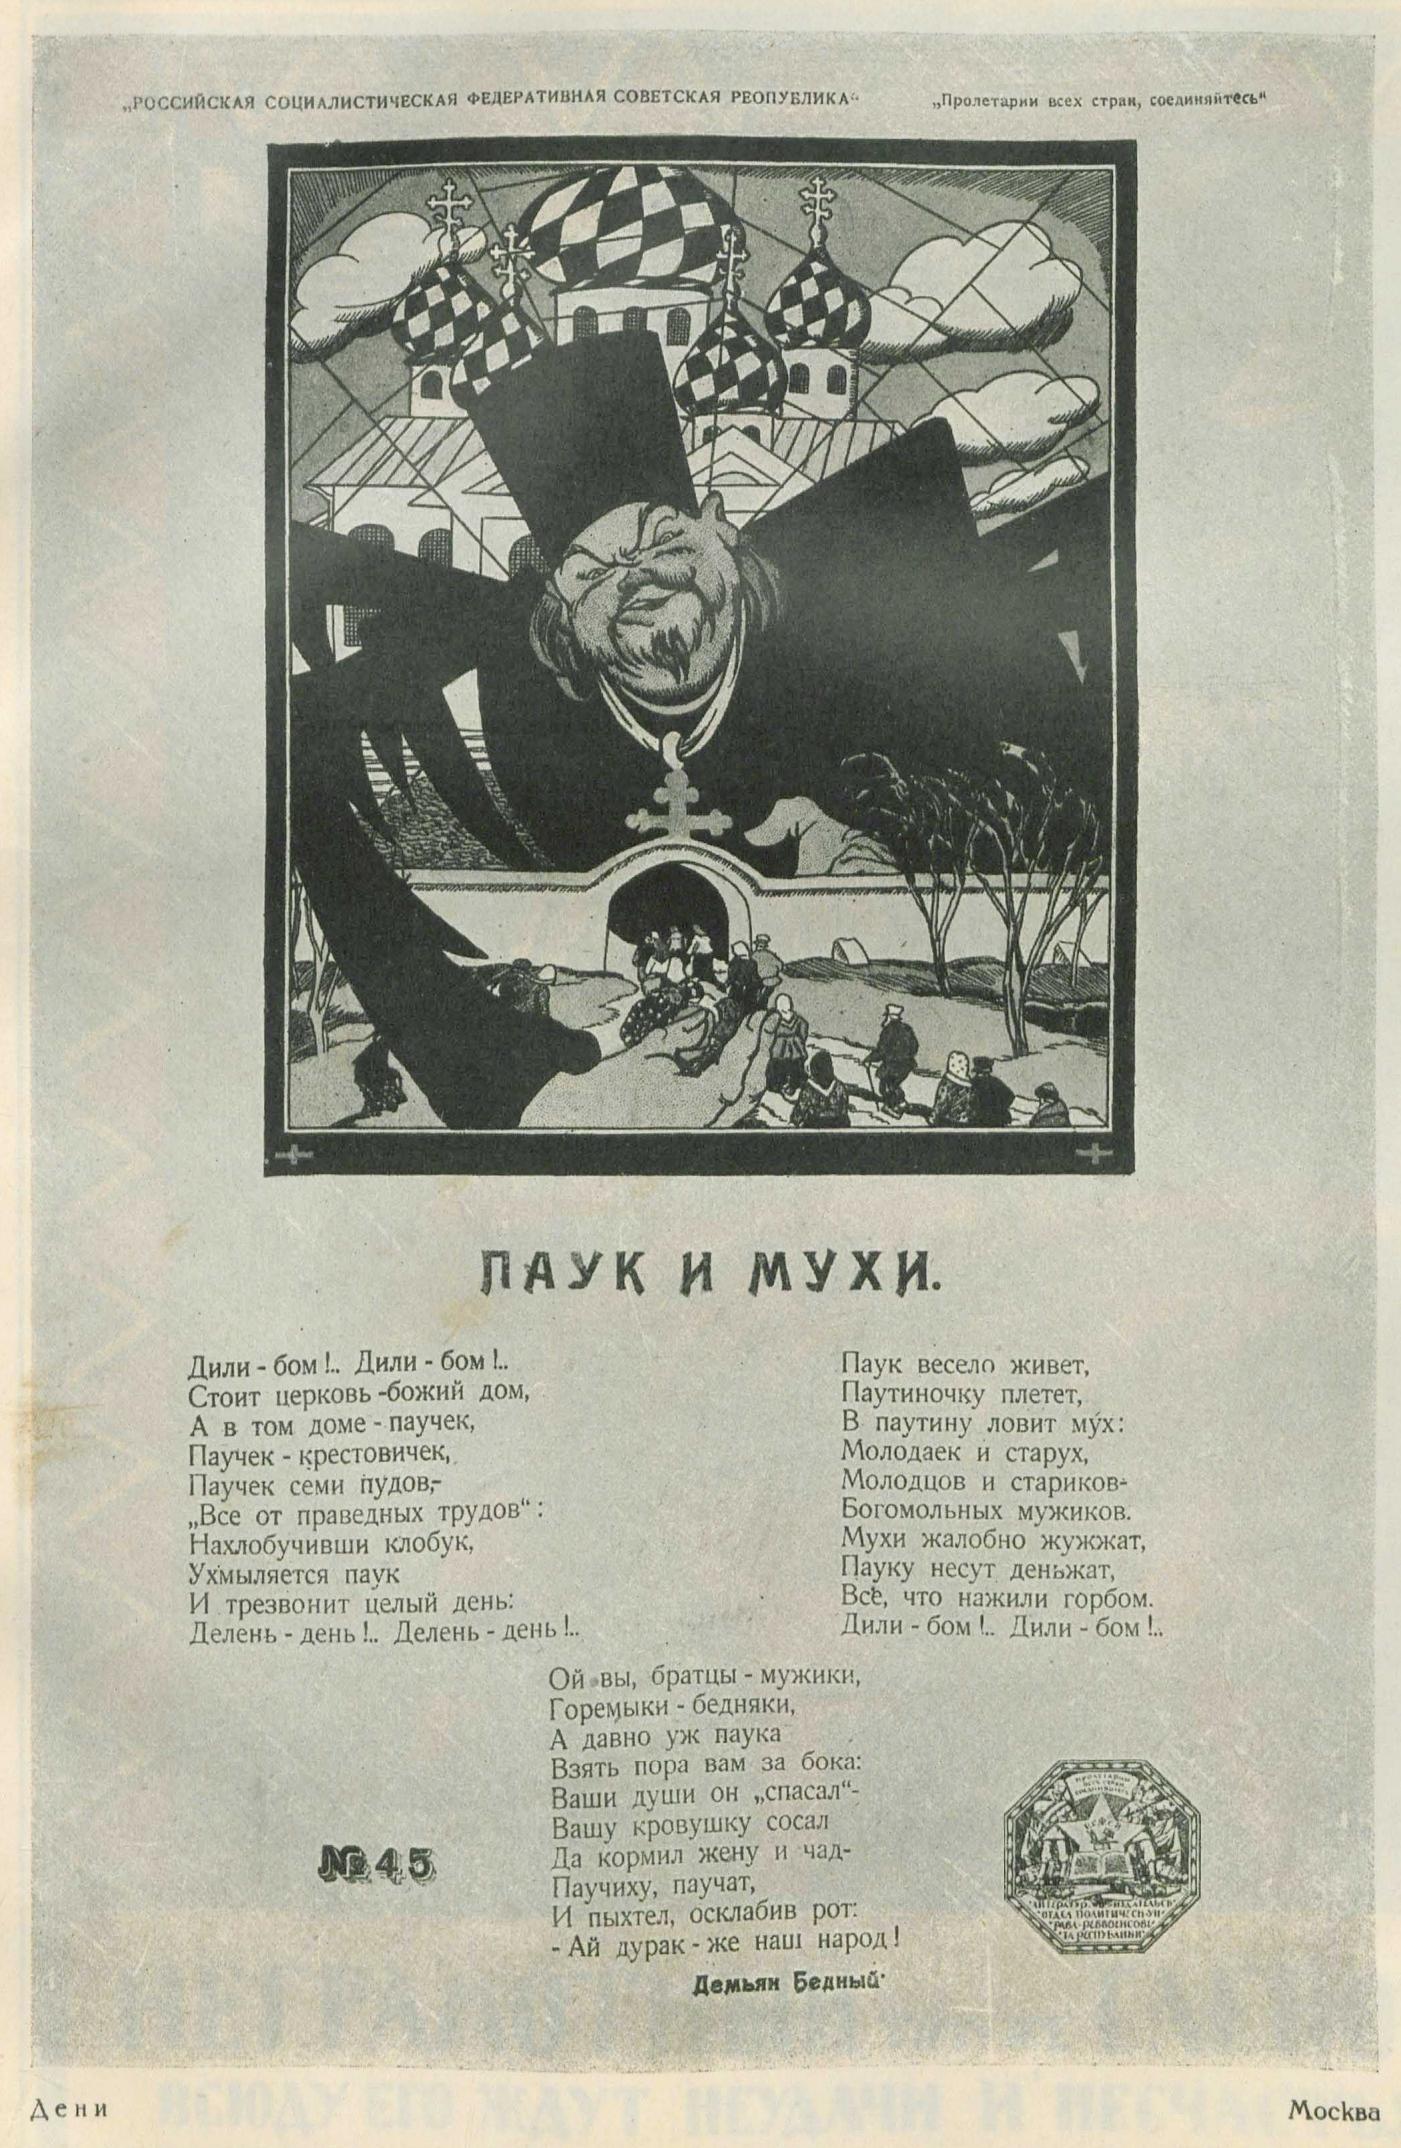 Дени. Москва ПАУК И МУХИ.